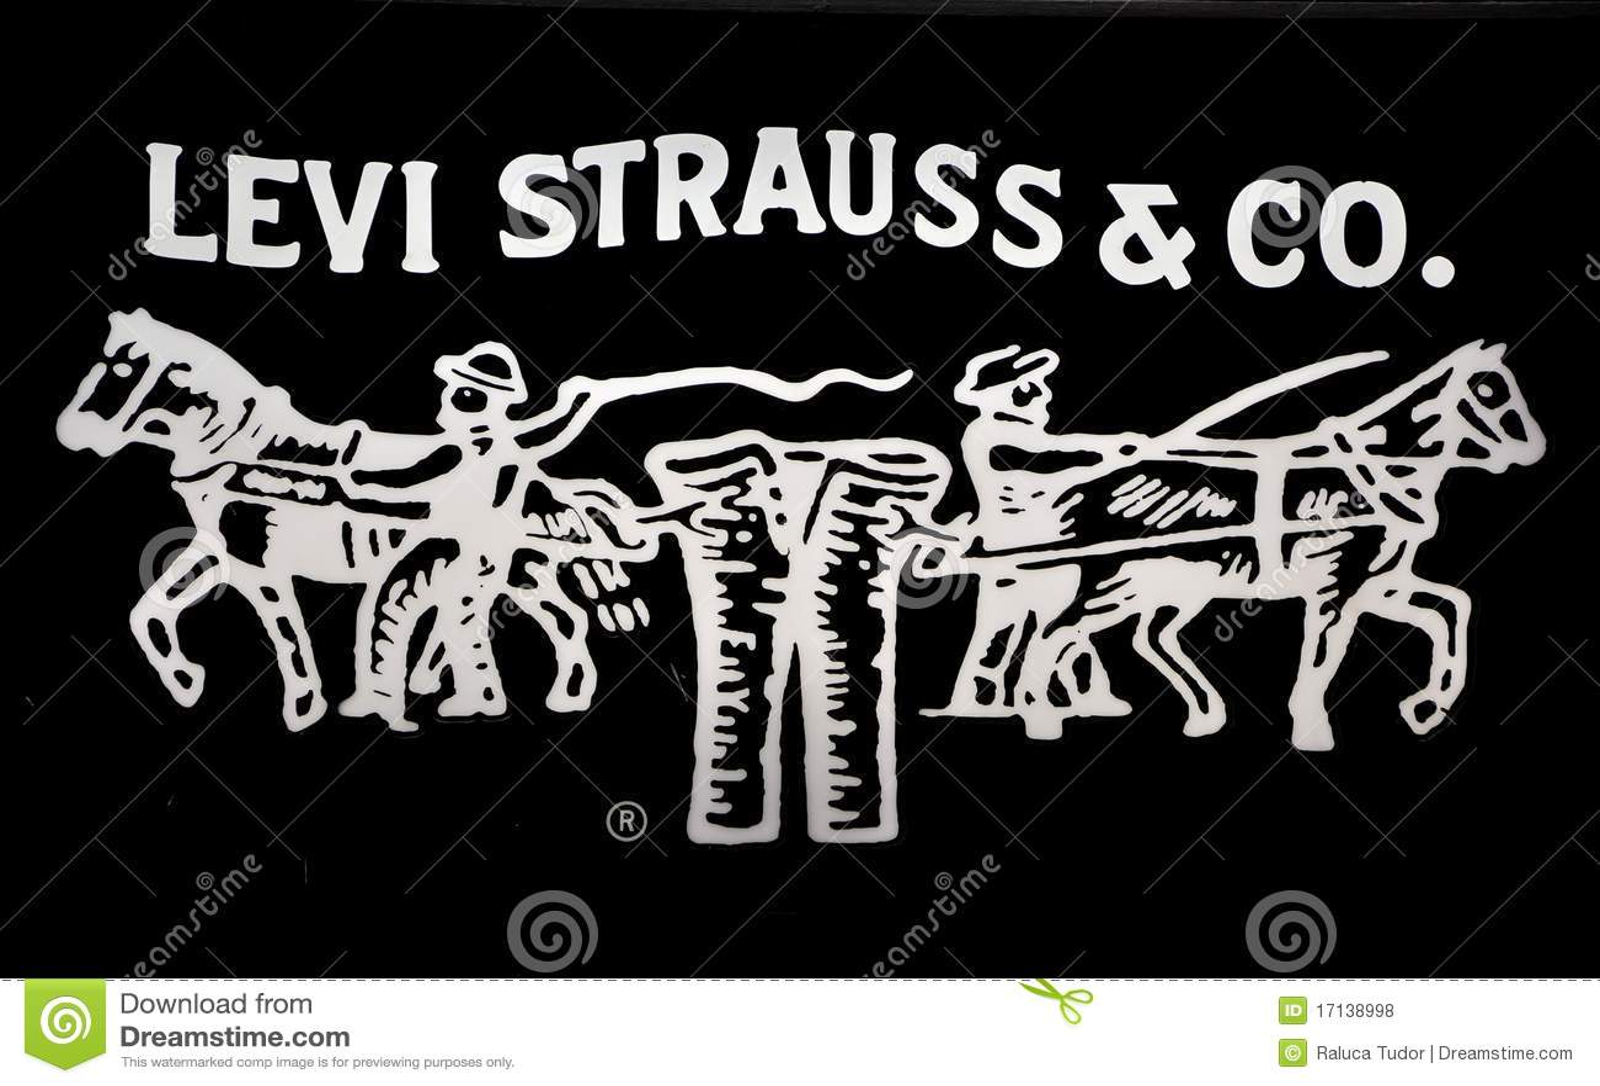 De jeansembleem van Levi strauss